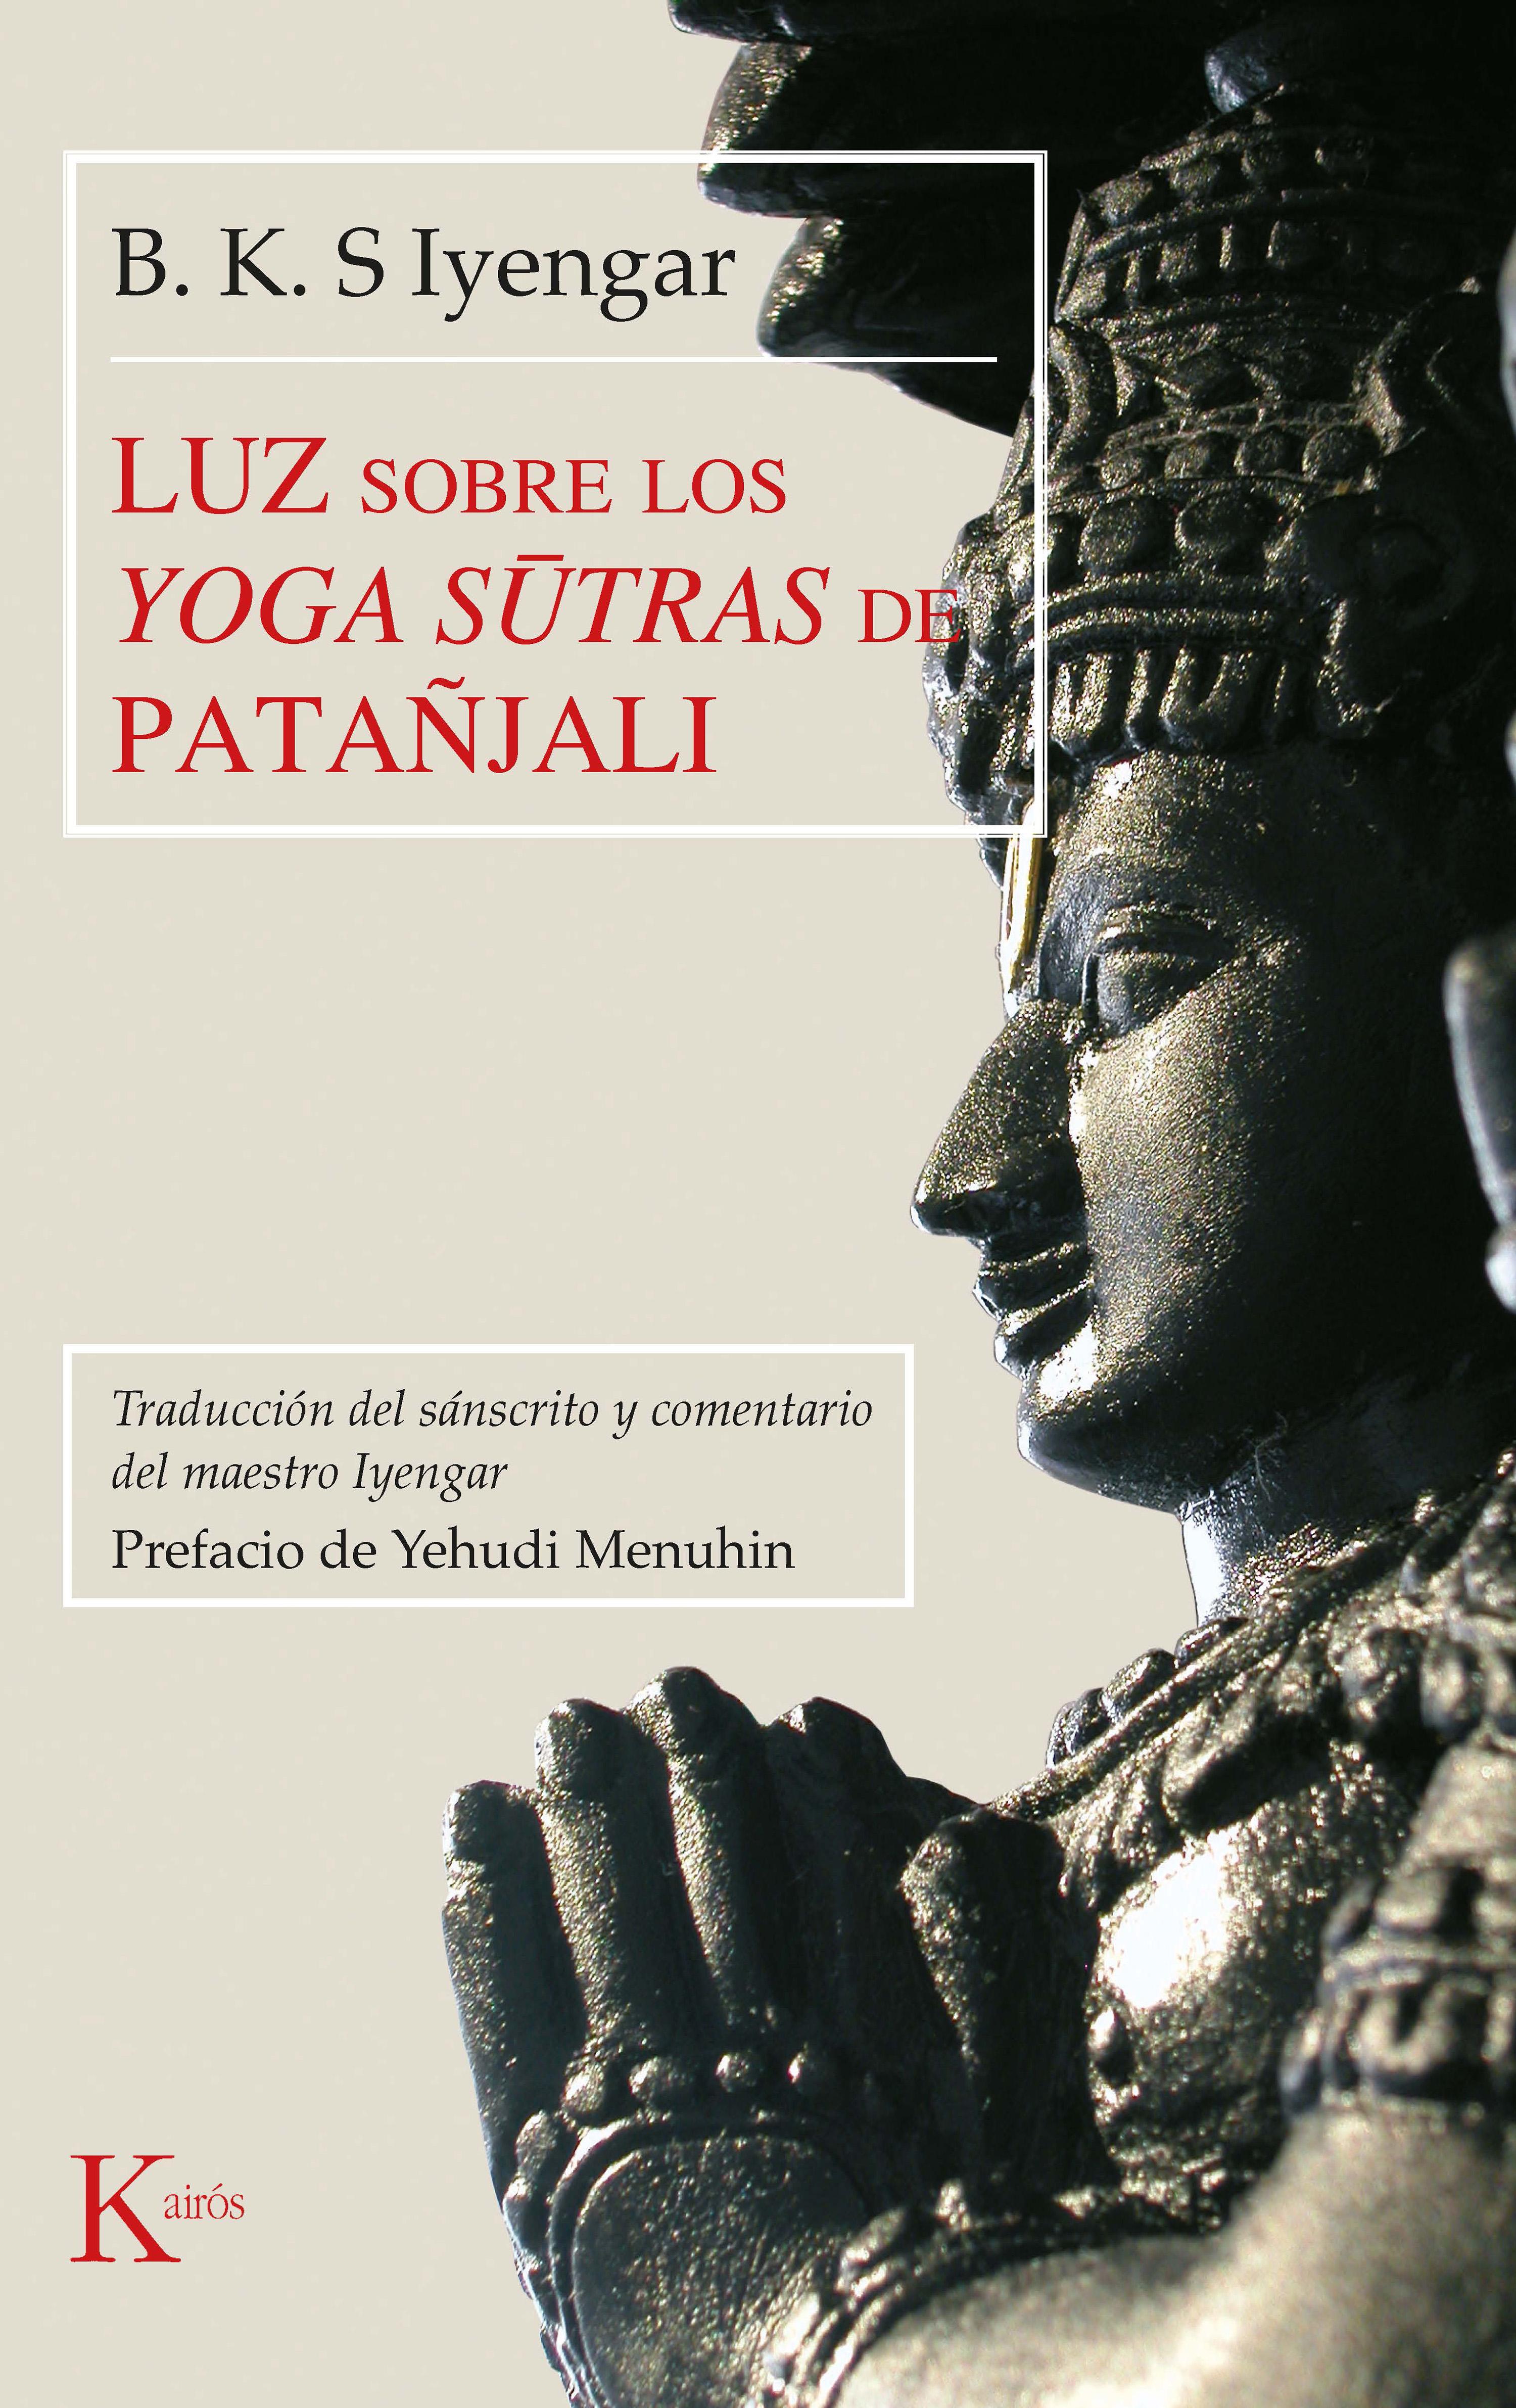 B.K.S Iyengar Luz sobre los Yoga sūtras de Patañjali b k s iyengar yoga